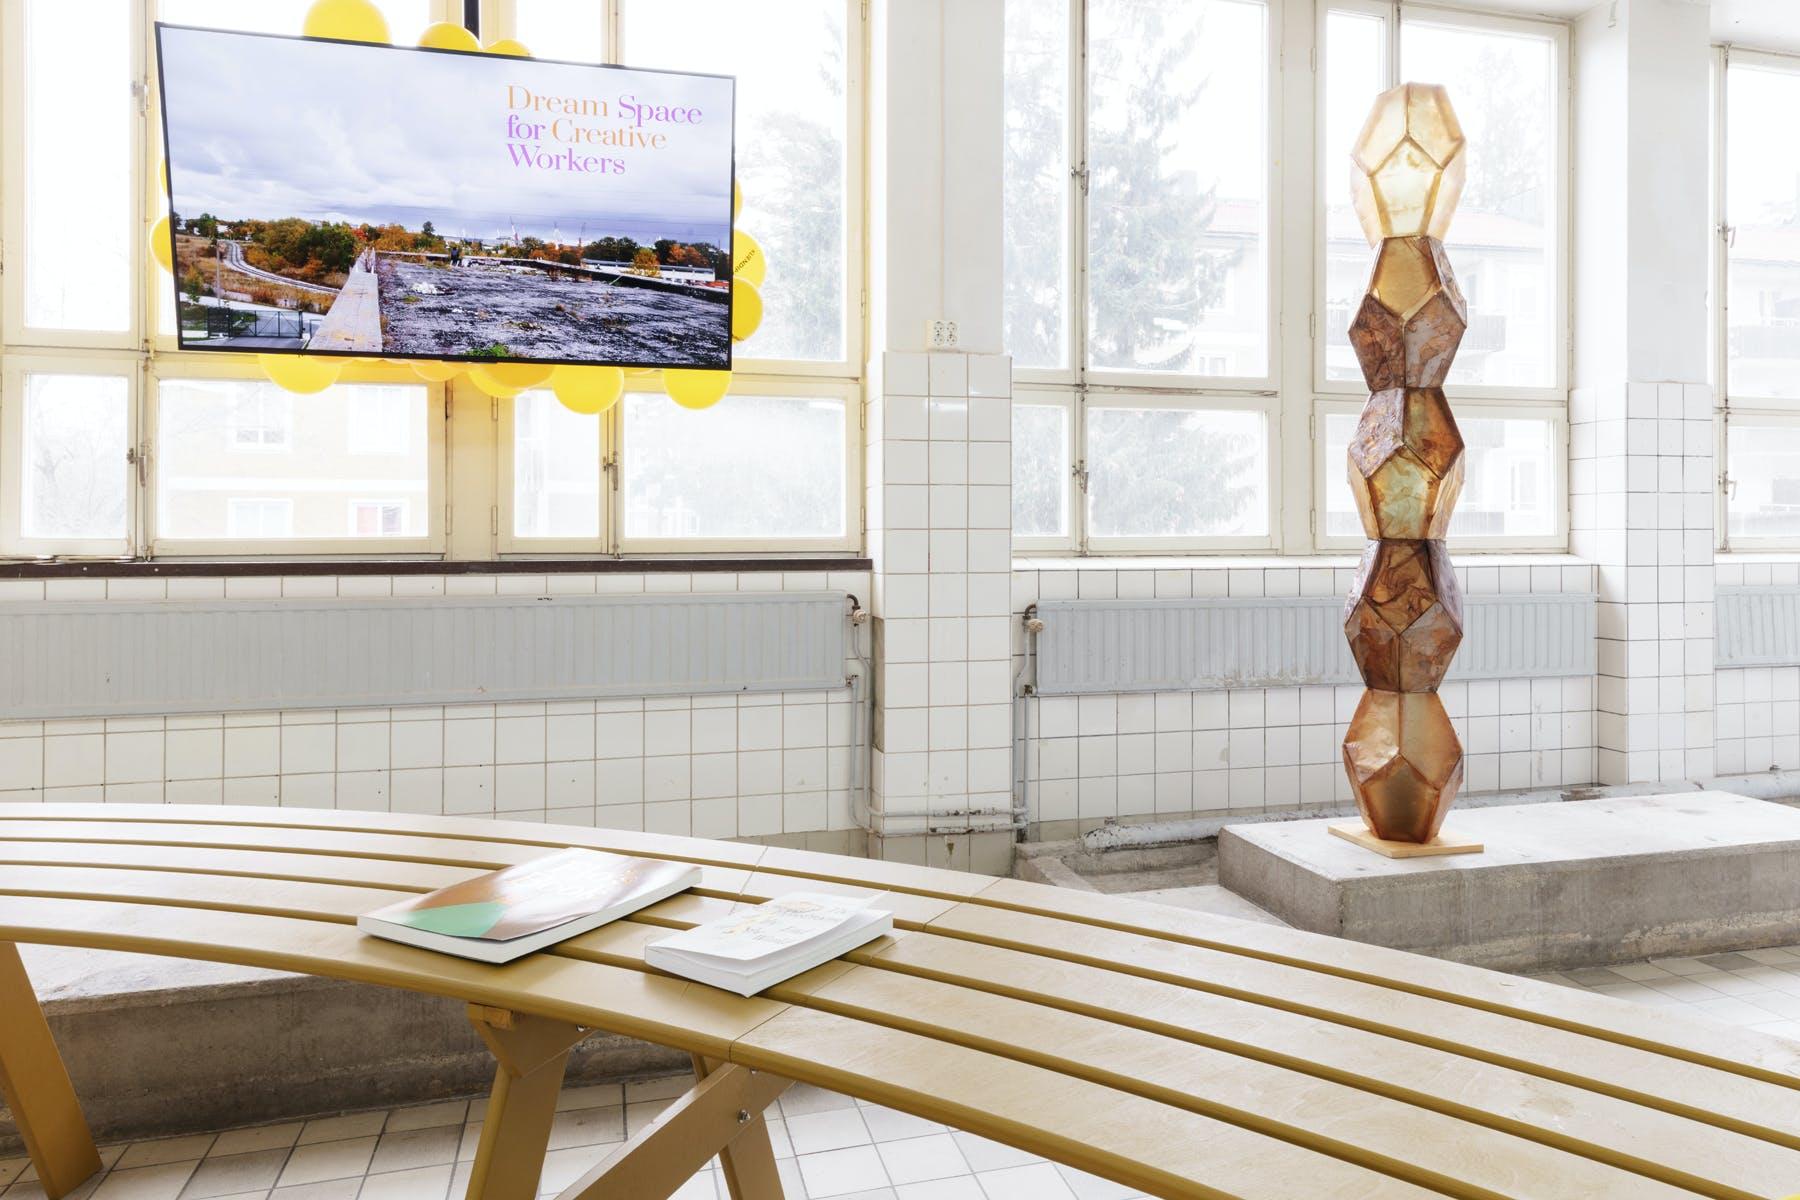 Work by Flo Kasearu and Urban Fauna Lab. Photo: Johan Österholm